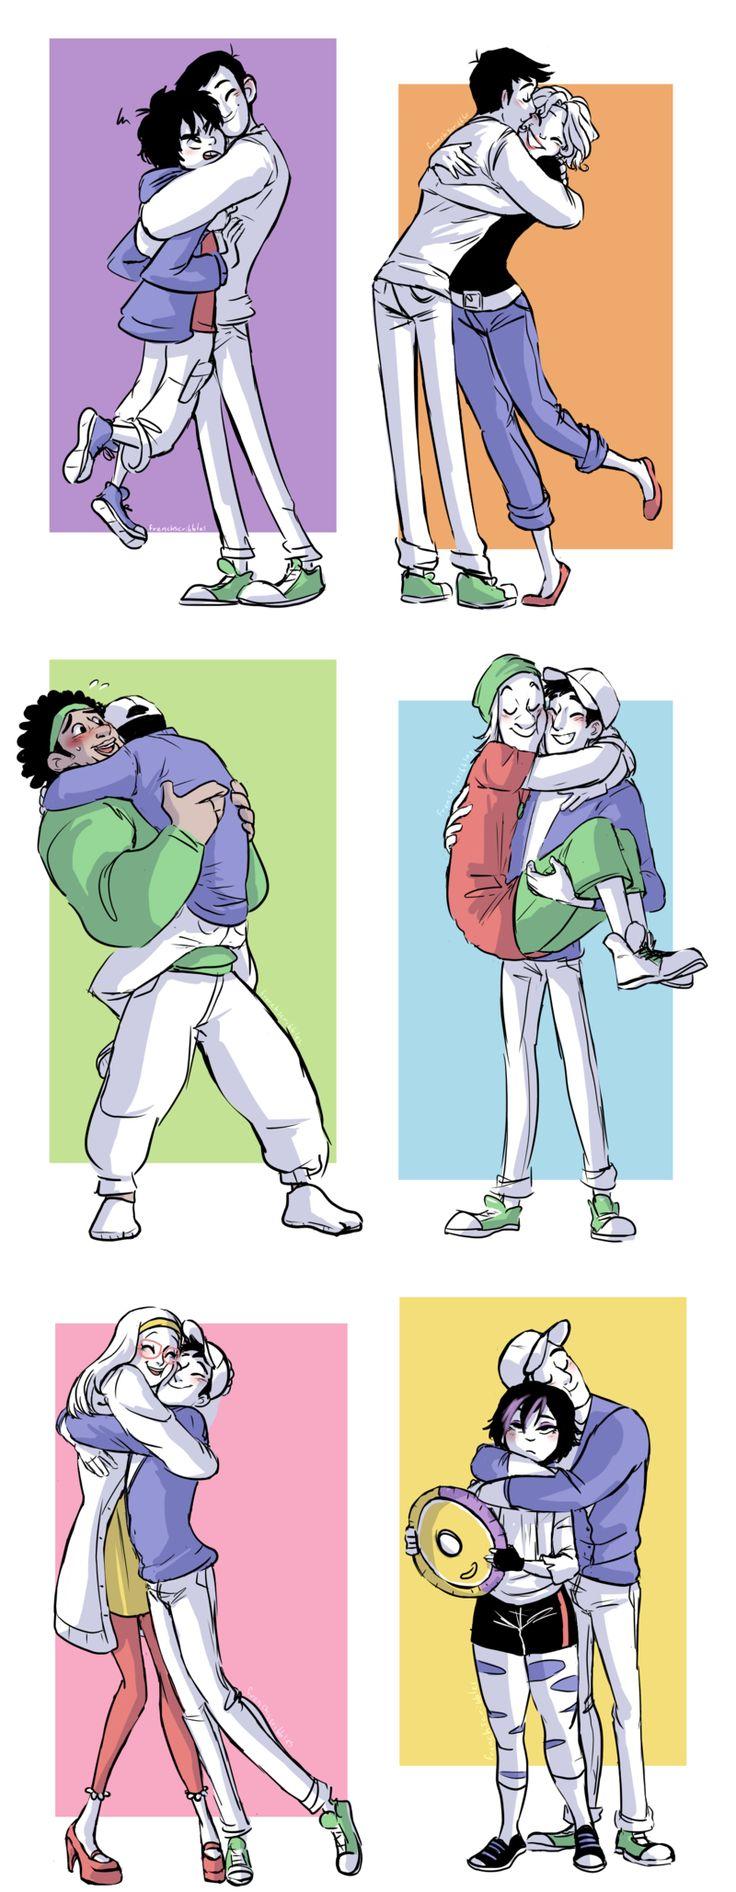 Tadashi Hamada the cuddle monster by kemiobsesses.deviantart.com on @DeviantArt